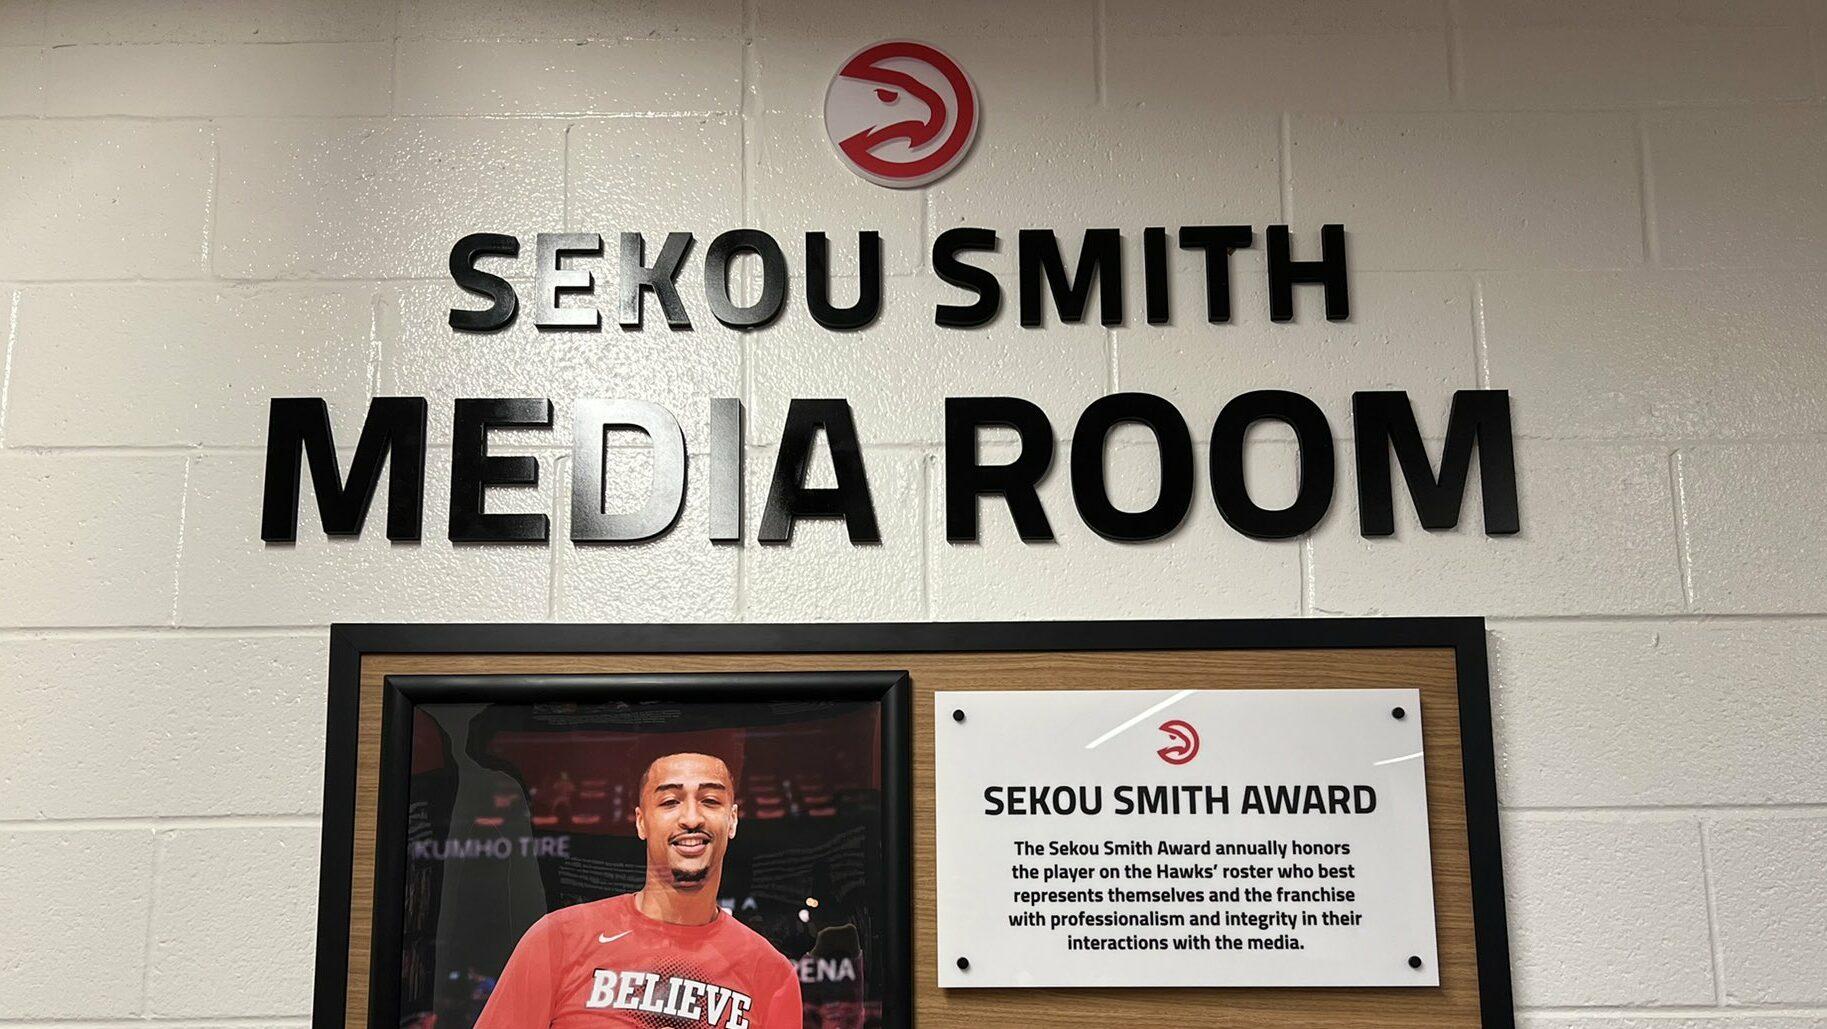 Hawks debut Sekou Smith Media Room at home opener